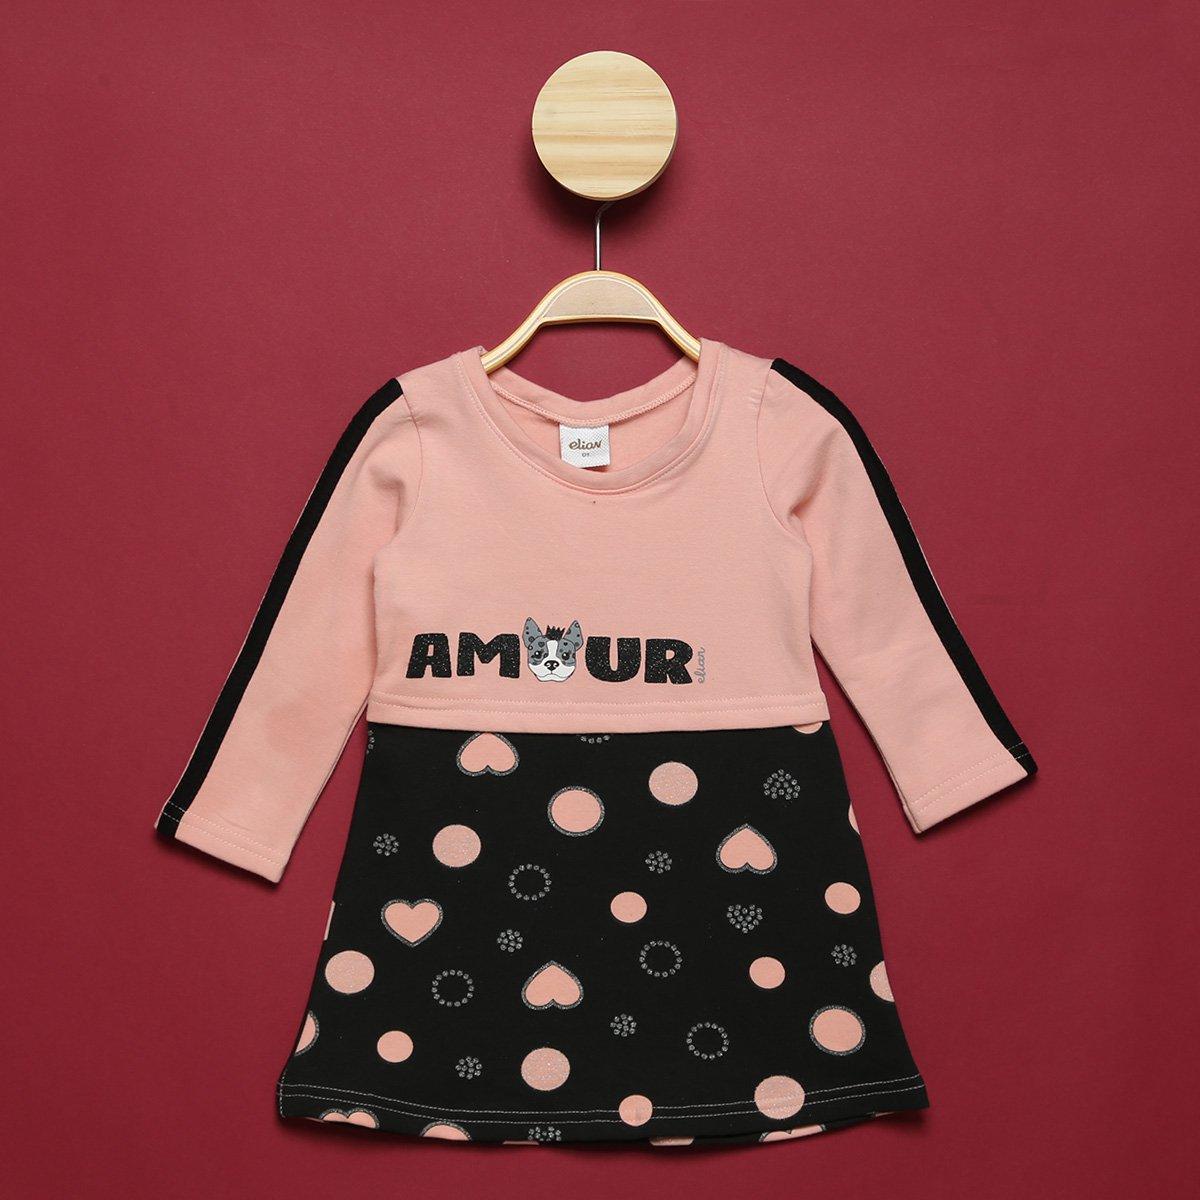 Vestido Bebê Elian Molecotton Amour Manga Longa